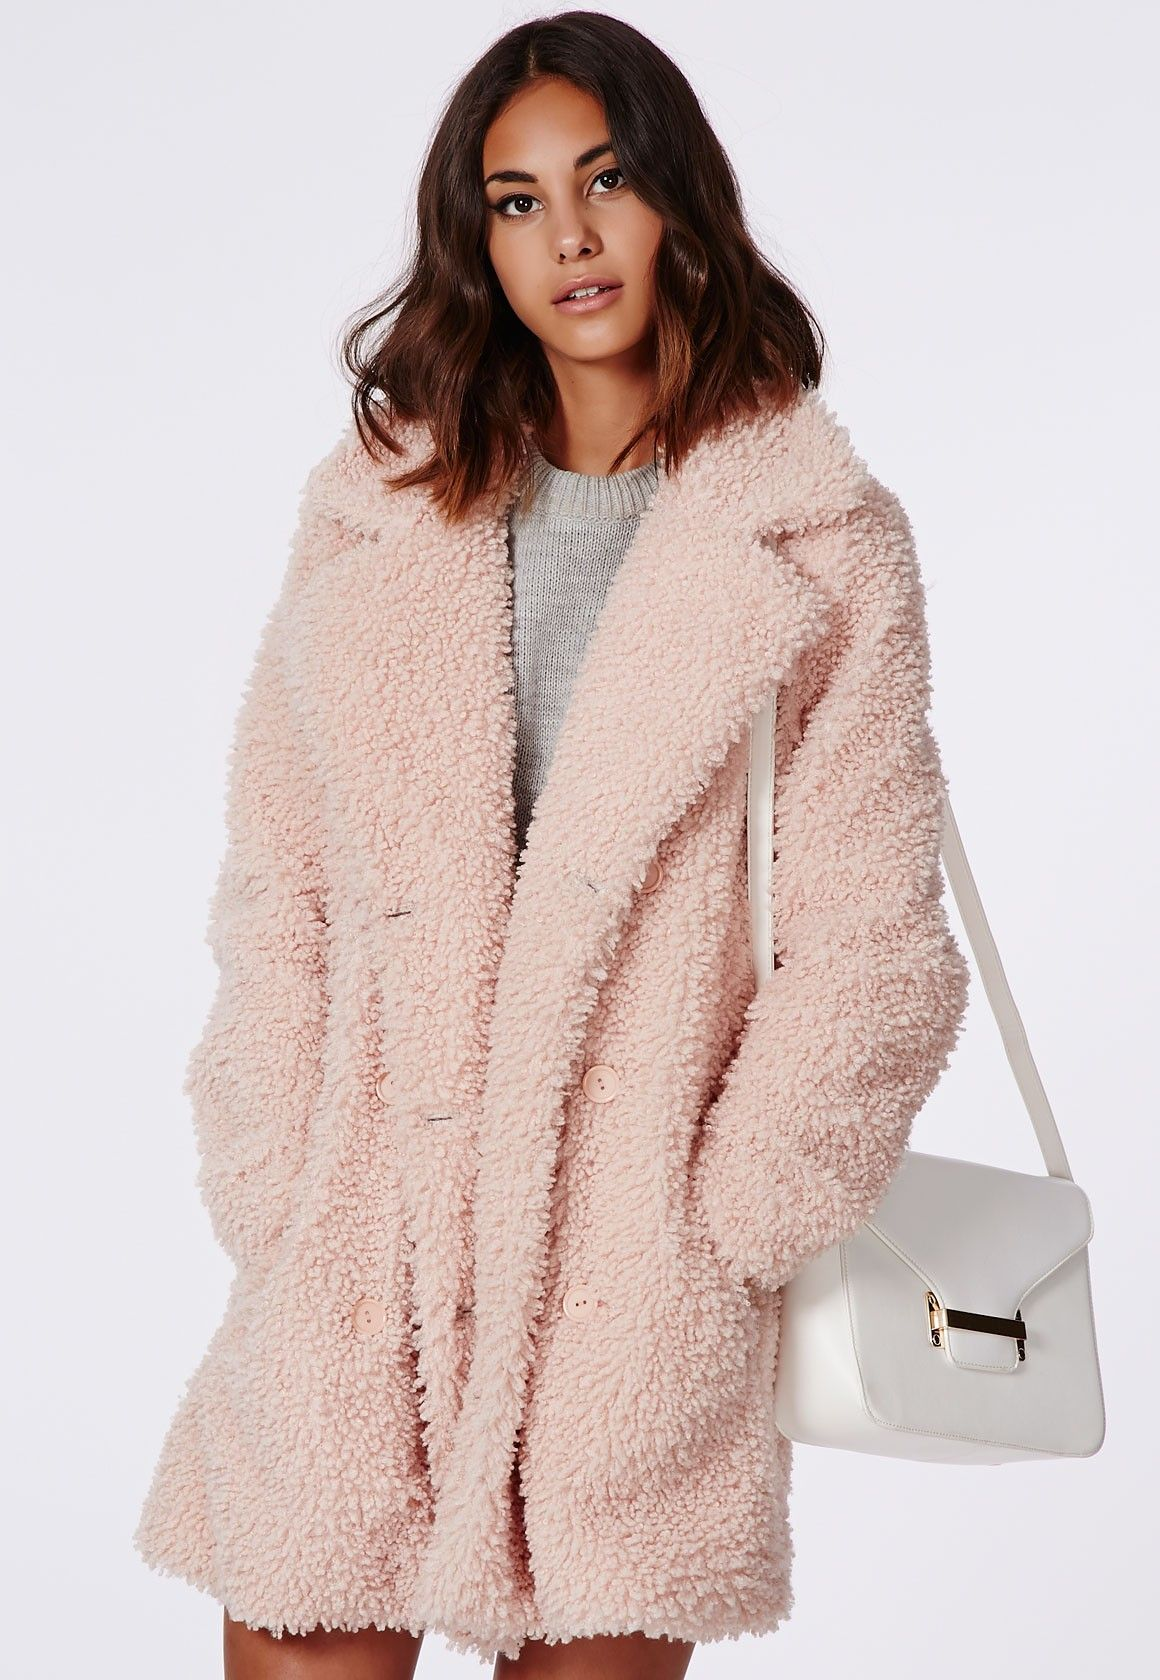 10cd3fd4bb4 Celine Teddy Faux Fur Pink - Coats   Jackets - Missguided